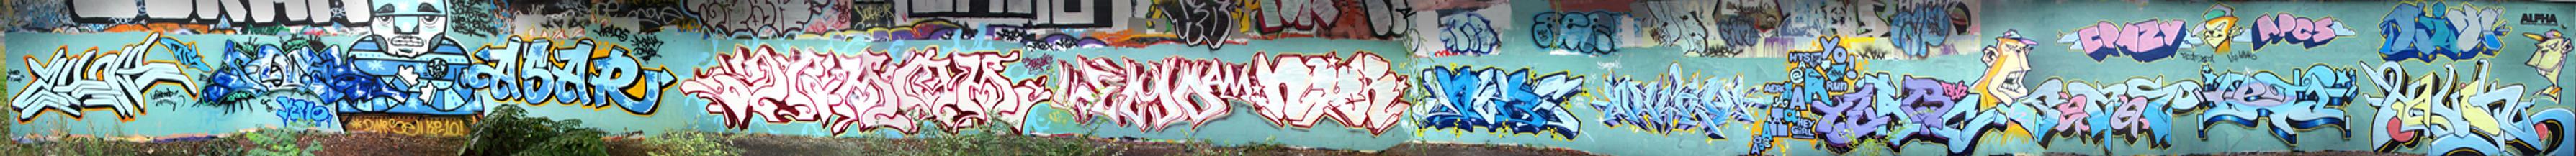 Crazy Apes Jam by MrHavok